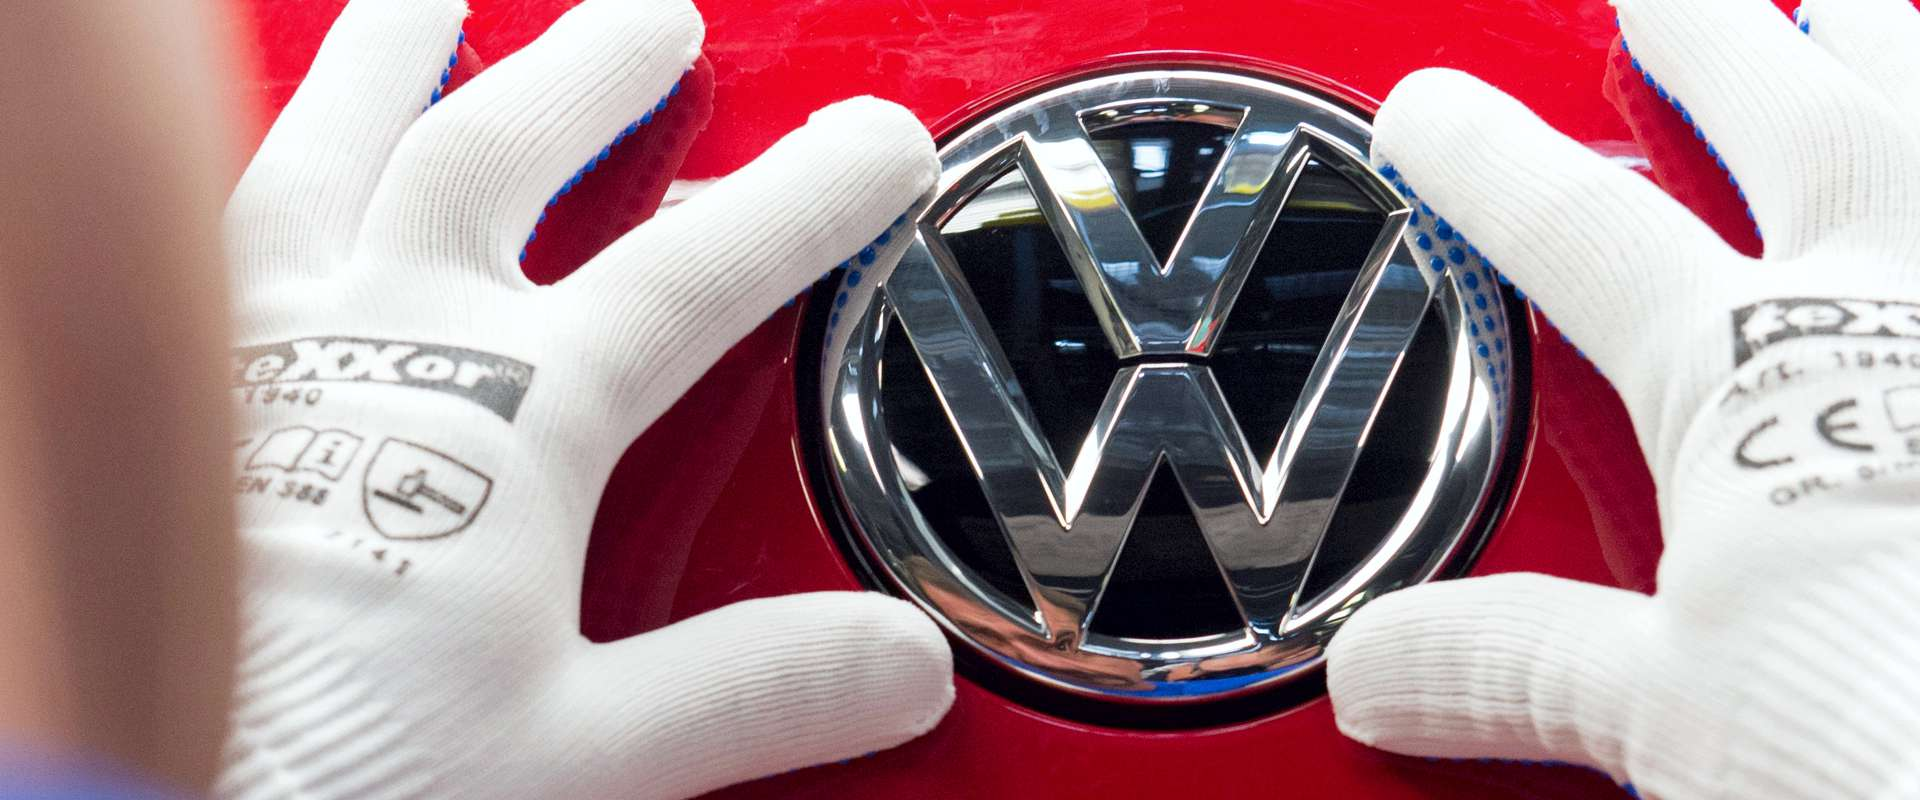 Tisuće Slovenaca će tužiti VW